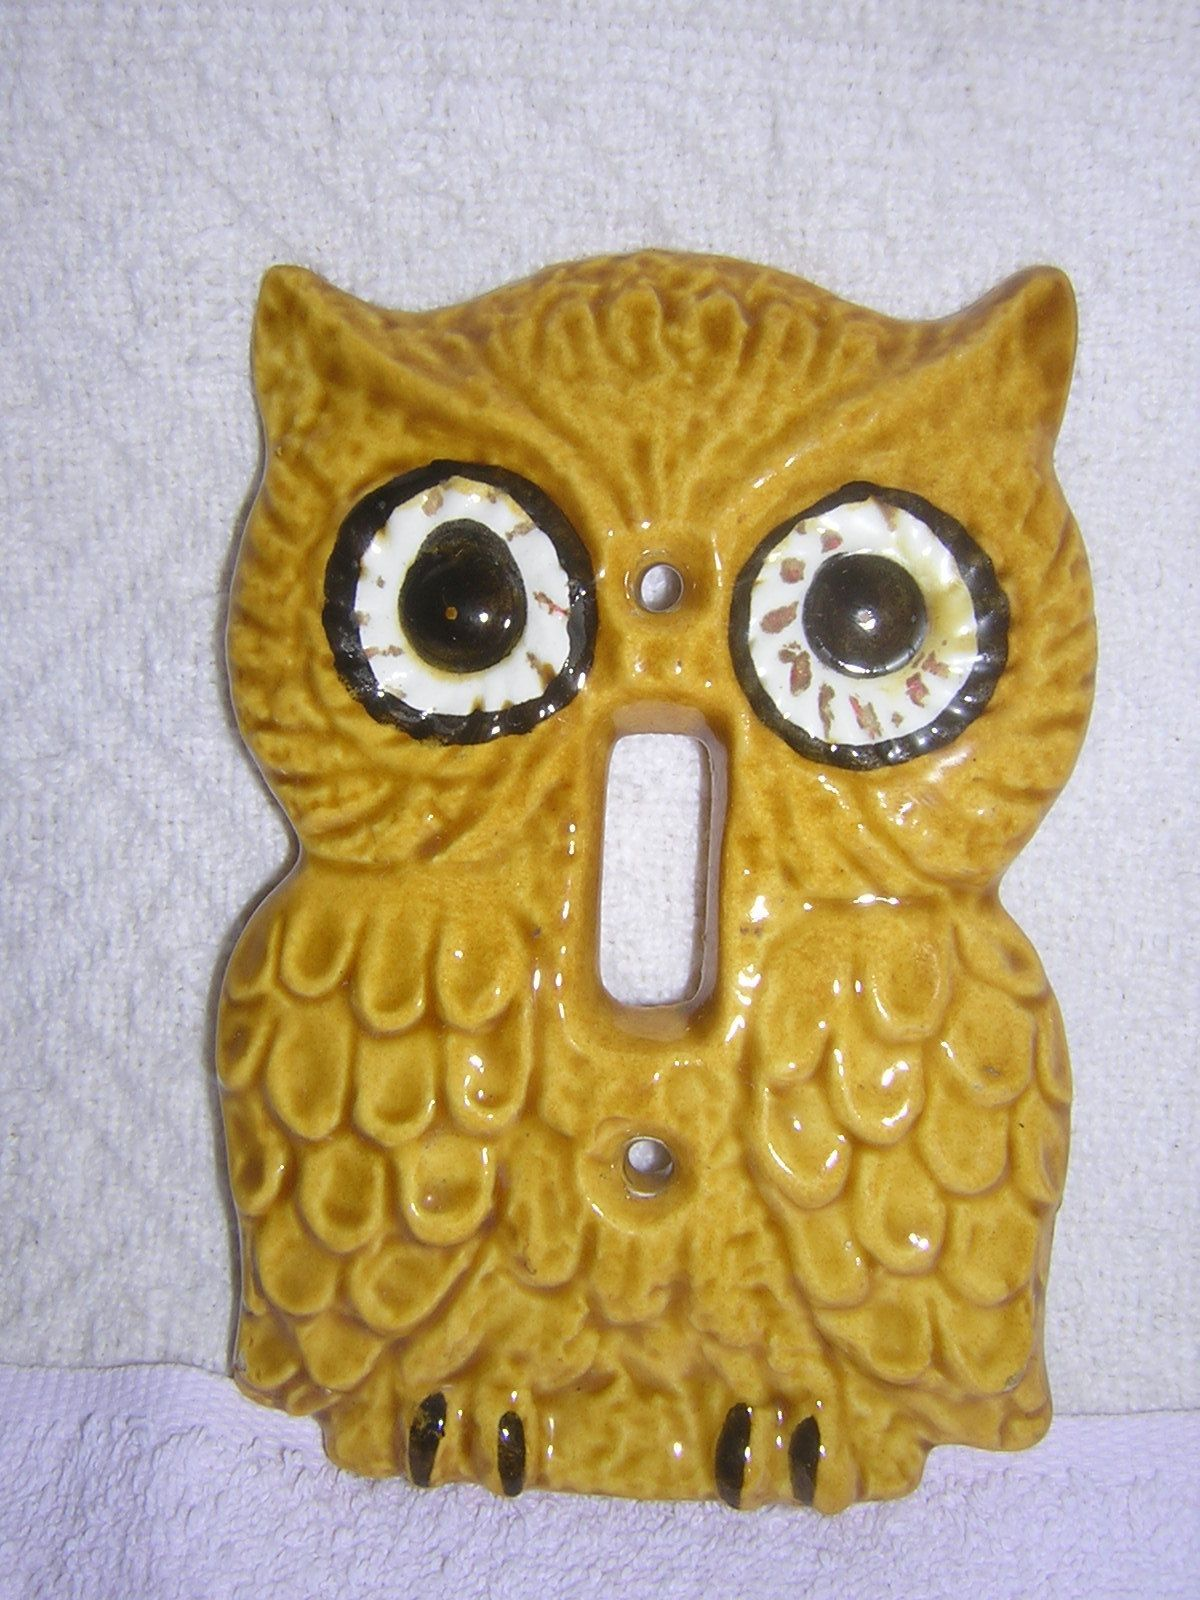 Vintage Enesco Ceramic Owl Wall Switch Plate | OWLS | Pinterest ...